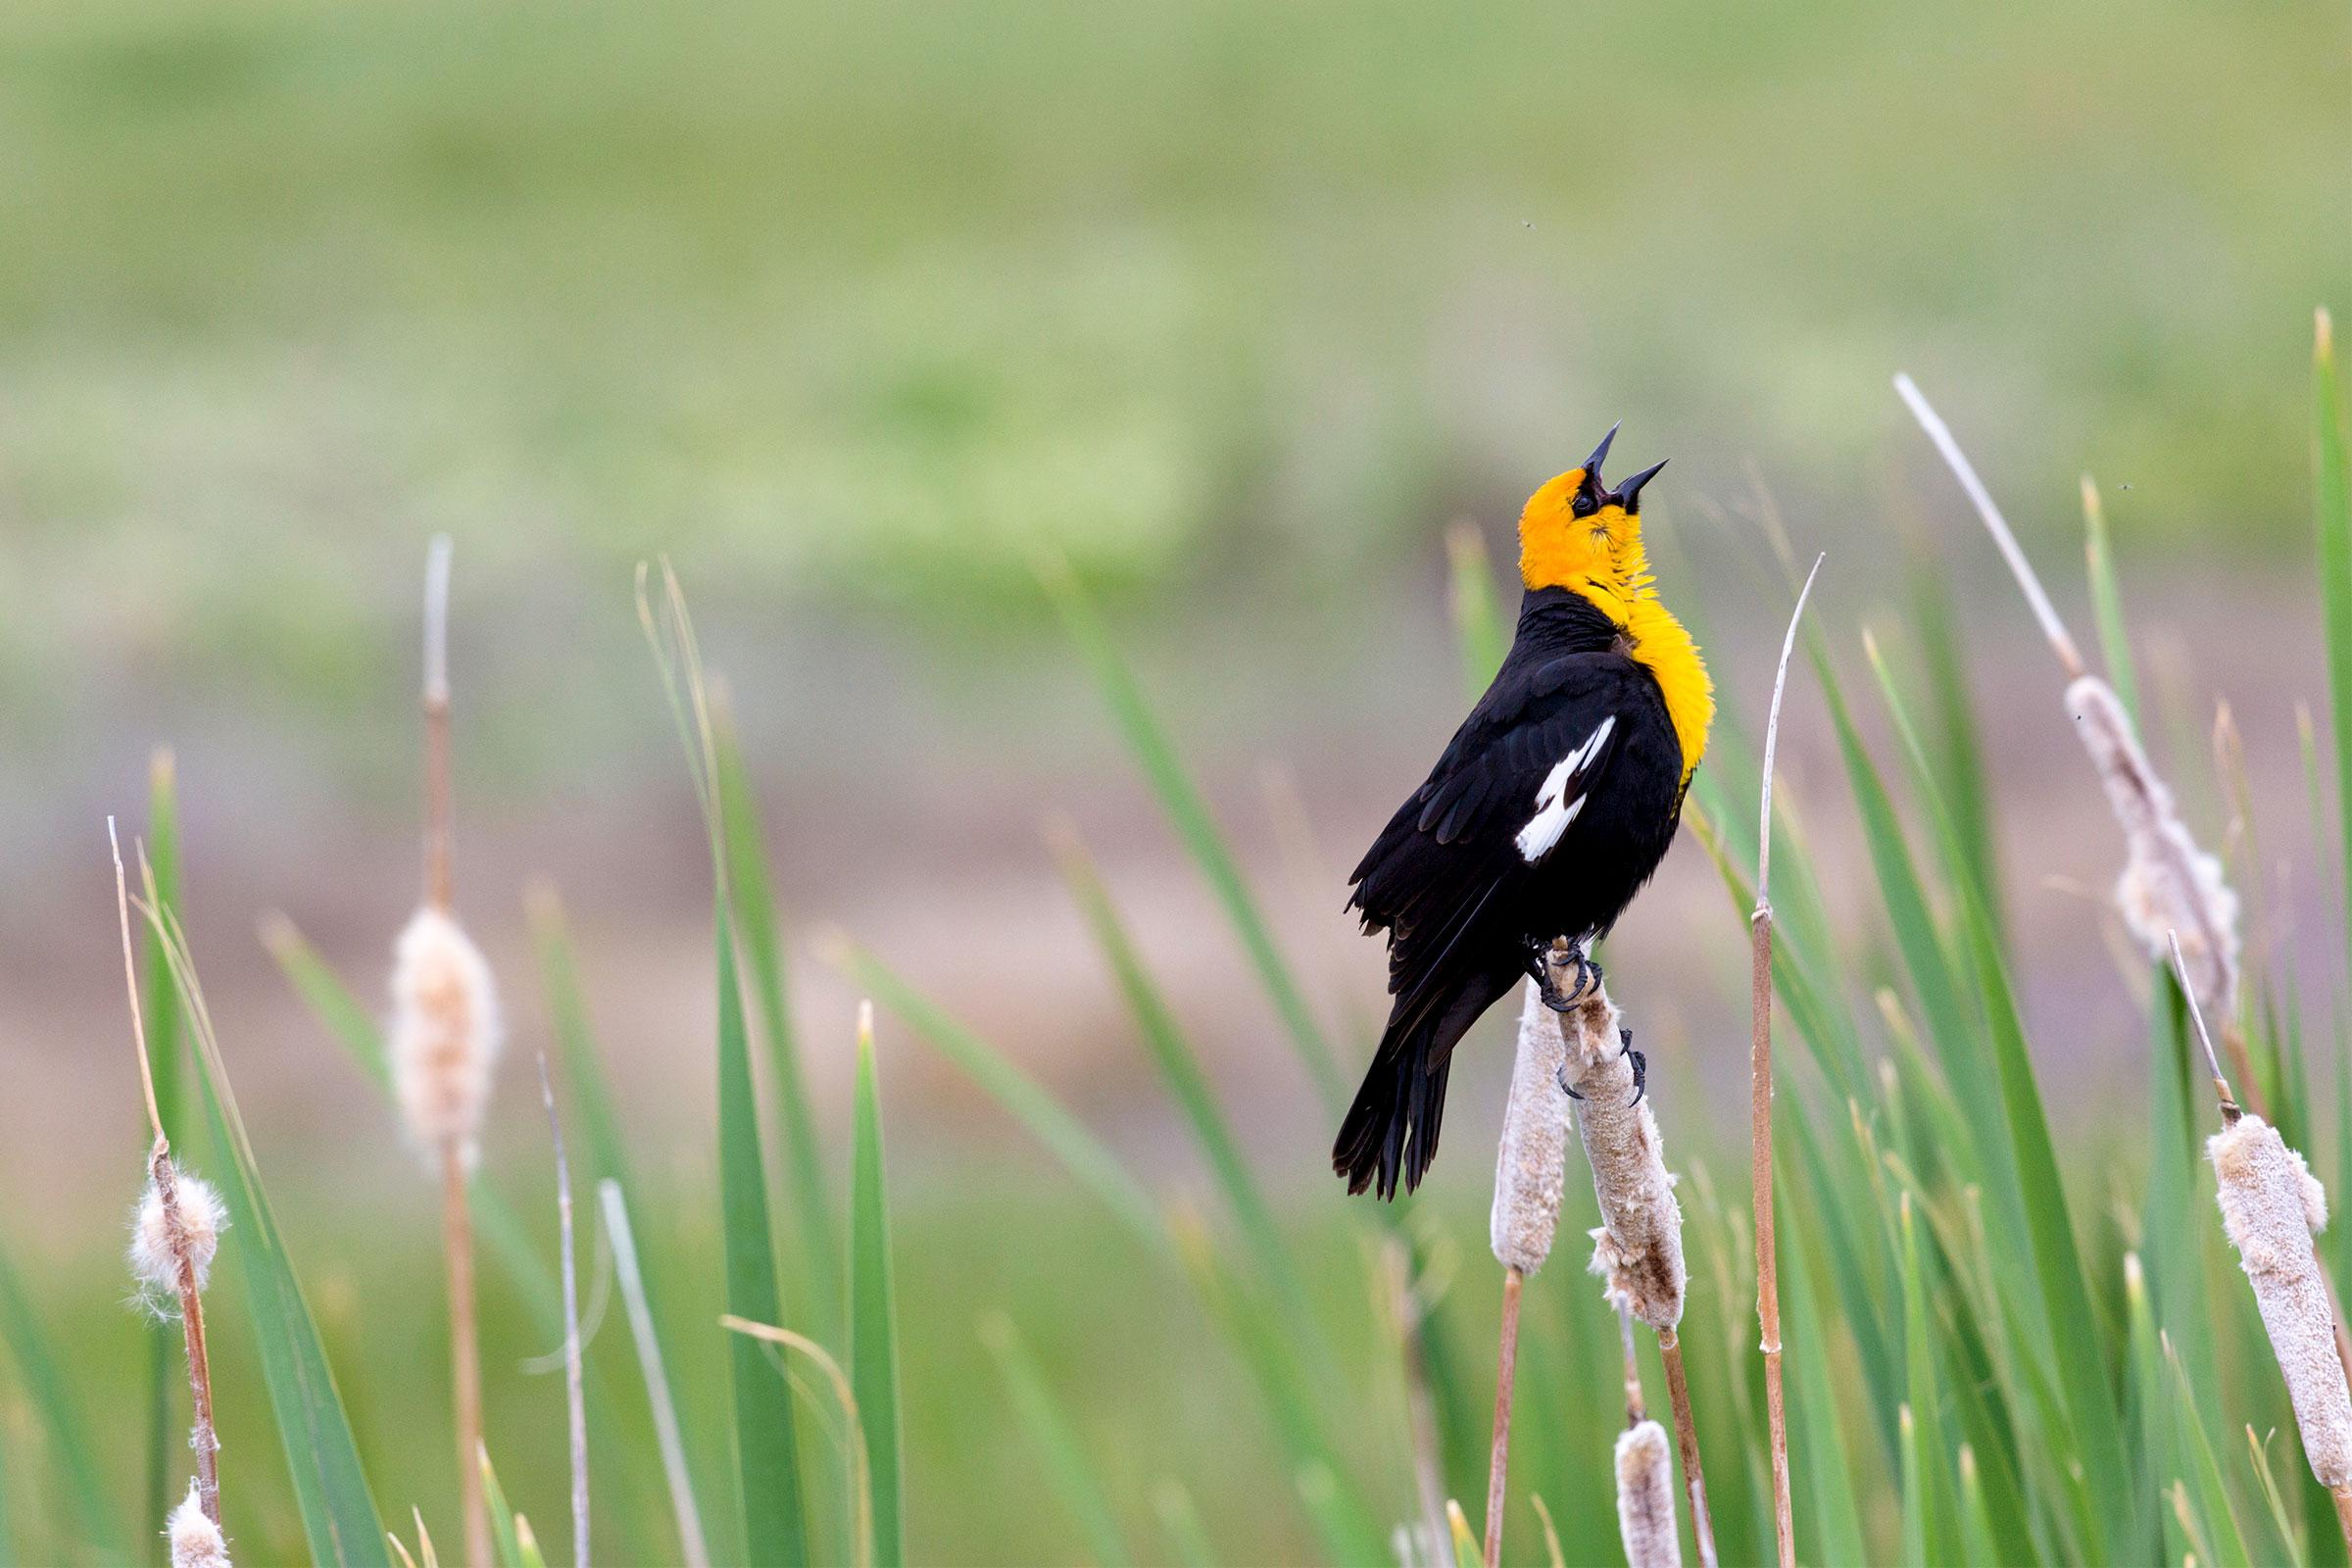 Yellow-headed Blackbird at the Great Salt Lake. Florence McGinn/Alamy